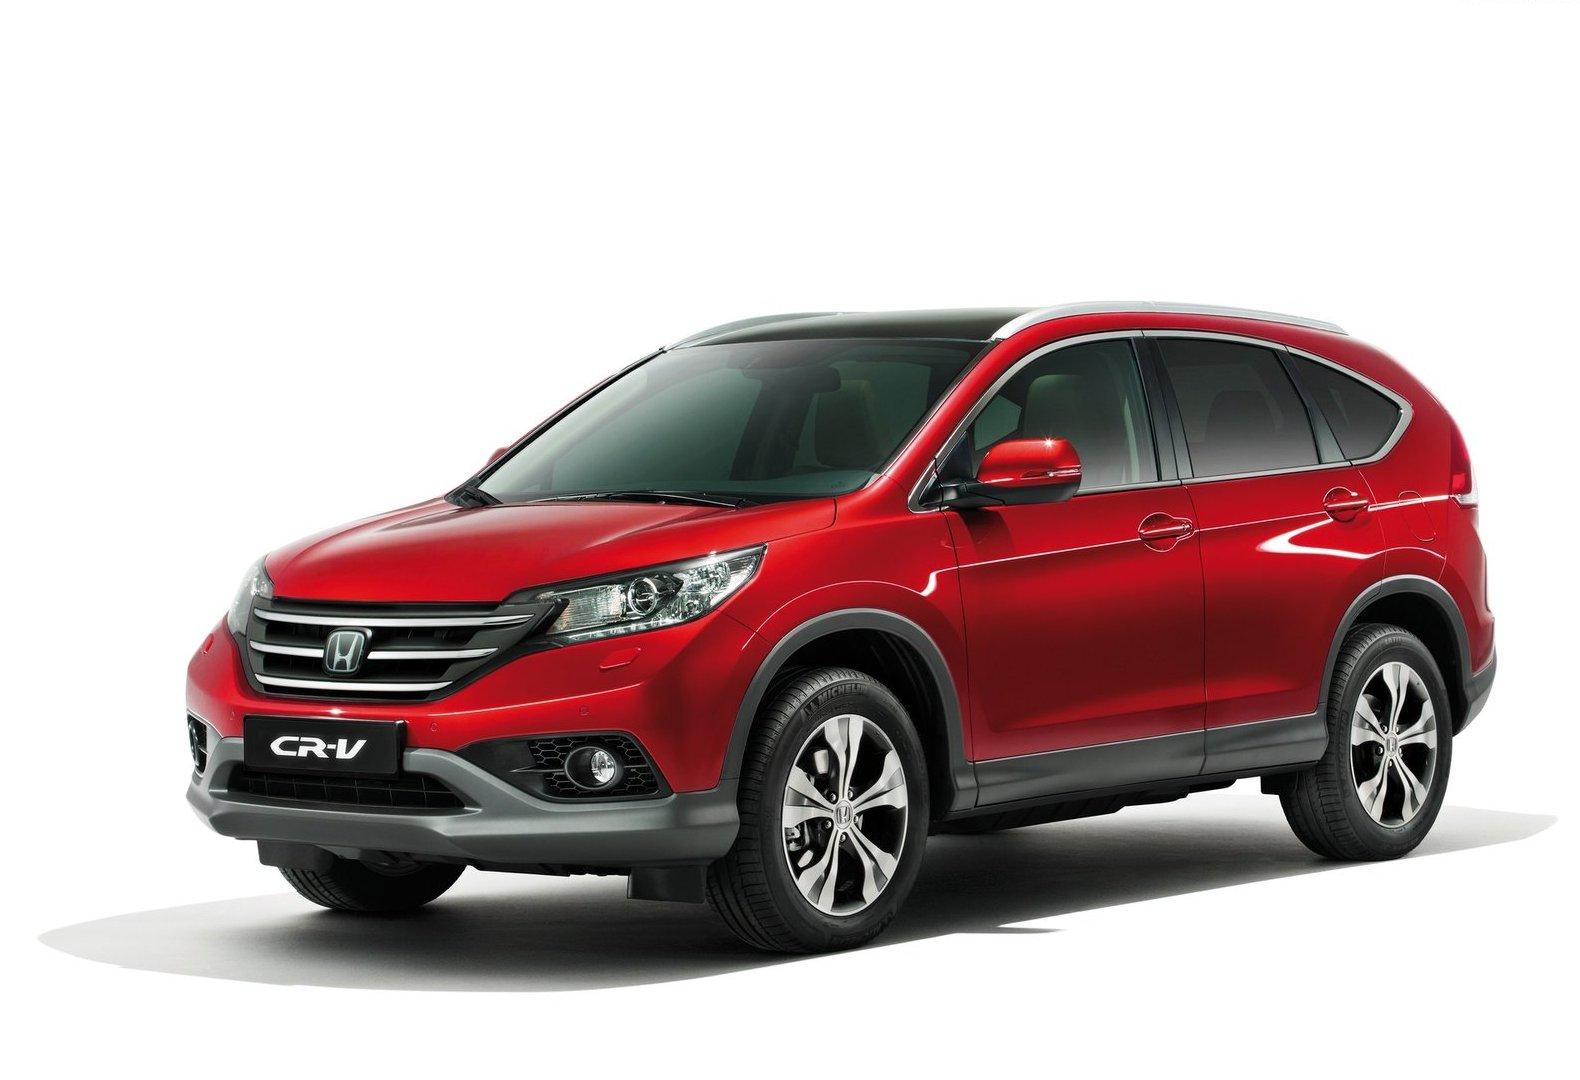 Honda CR-V ön görünüş